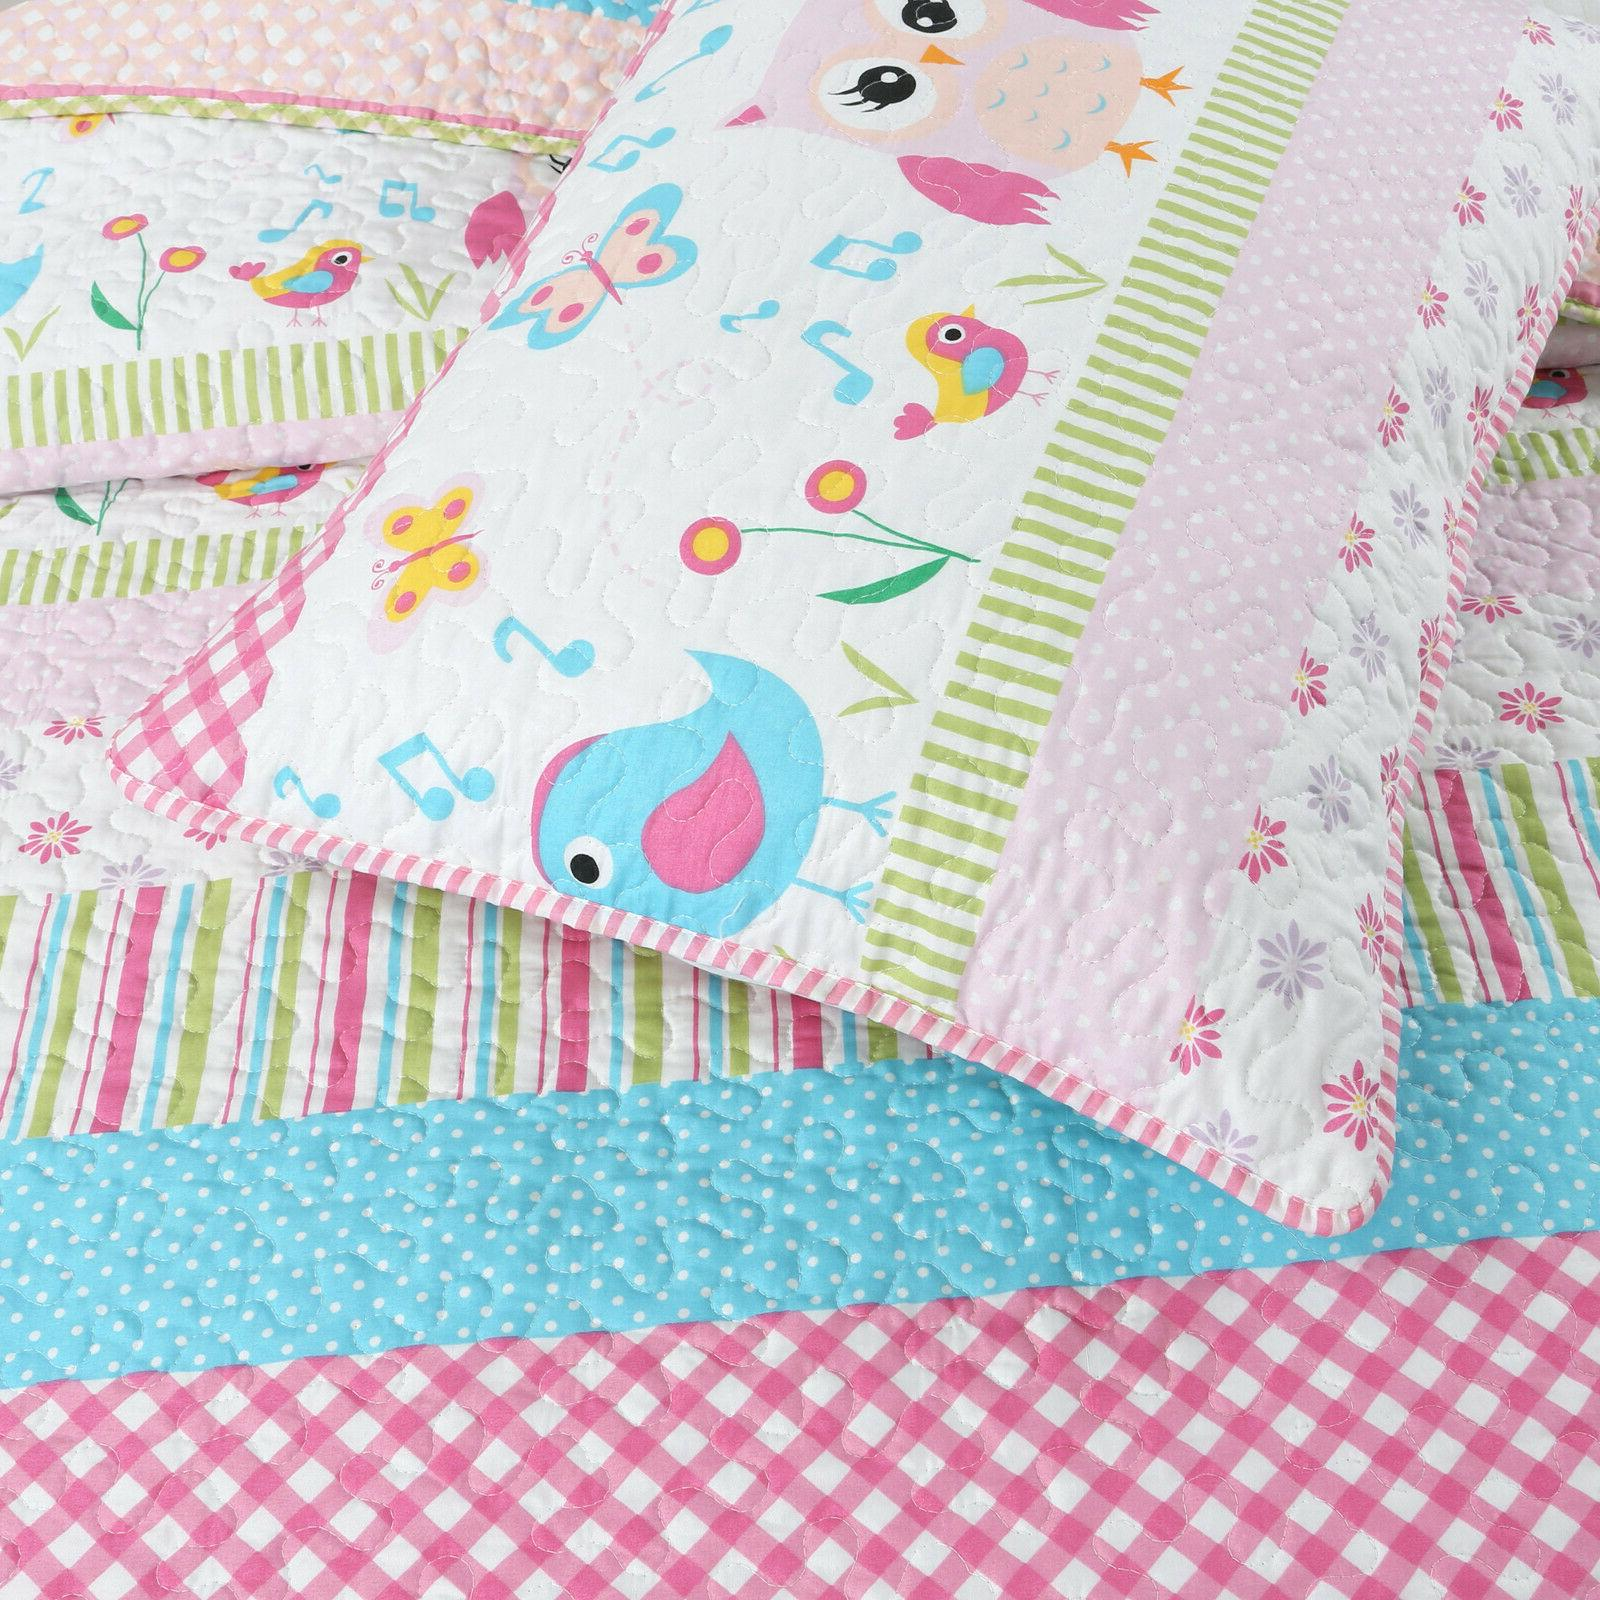 Home Pink Print Girl Bedspread, Coverlet